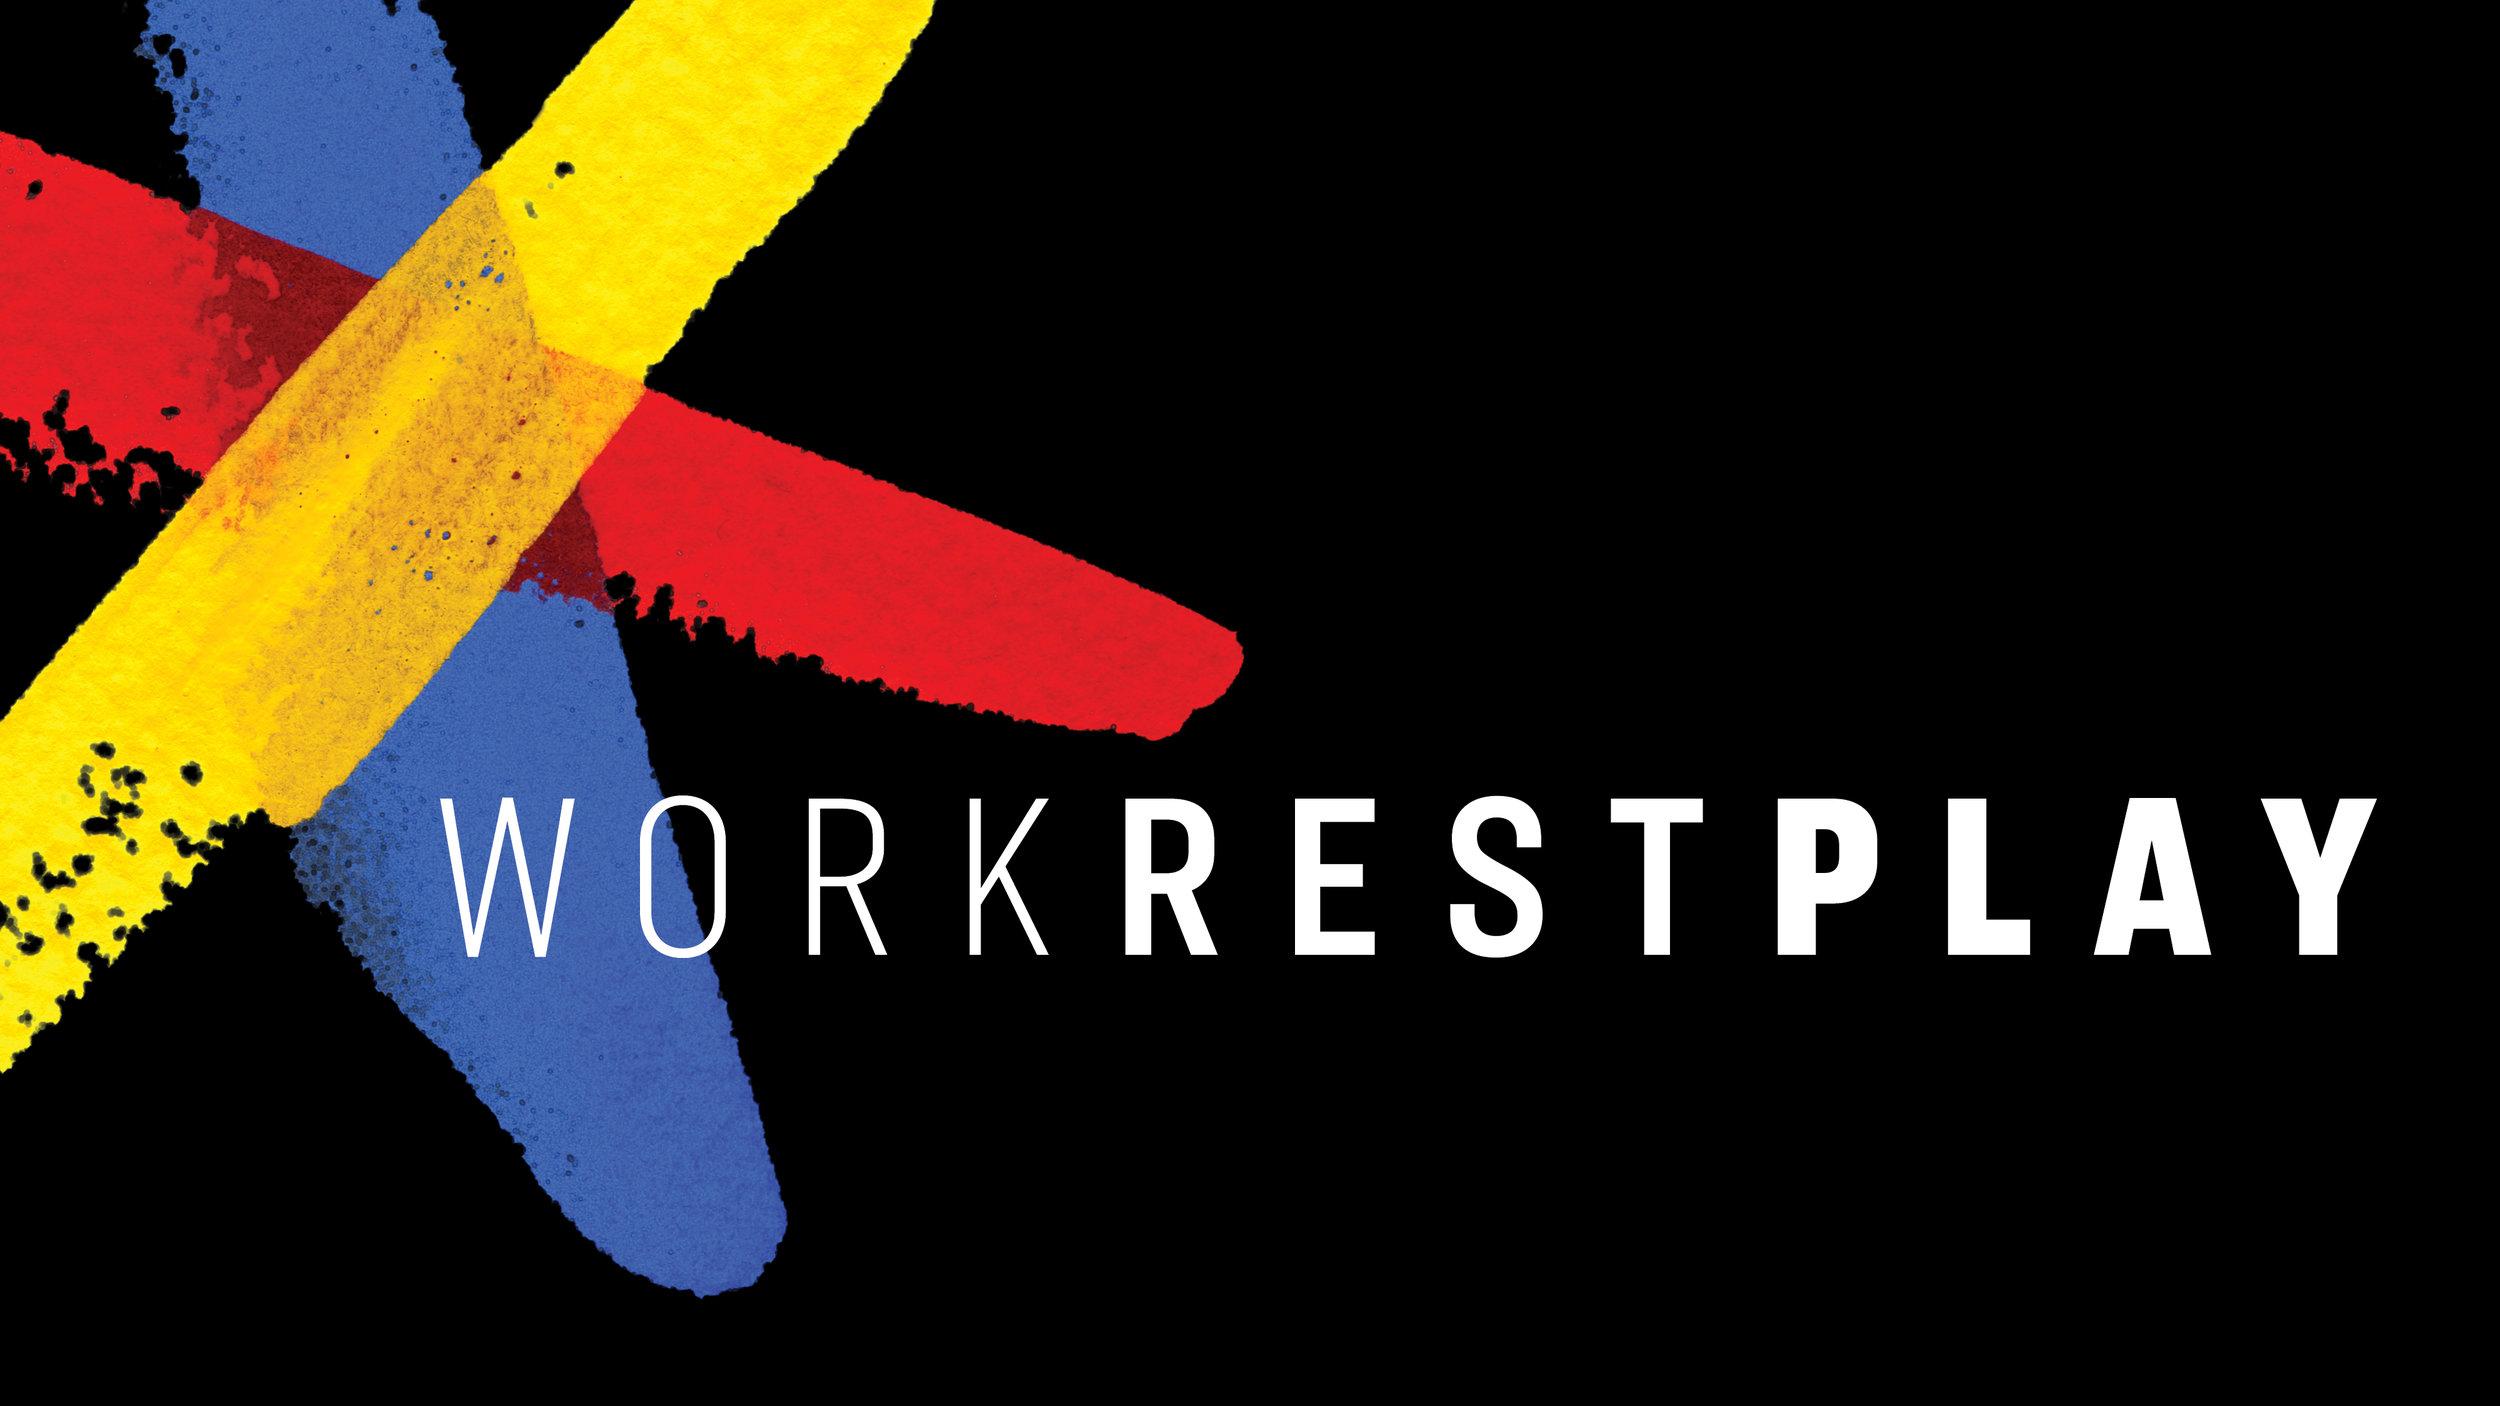 Work Rest Play_Web Graphic_1920x1080_fa.jpg